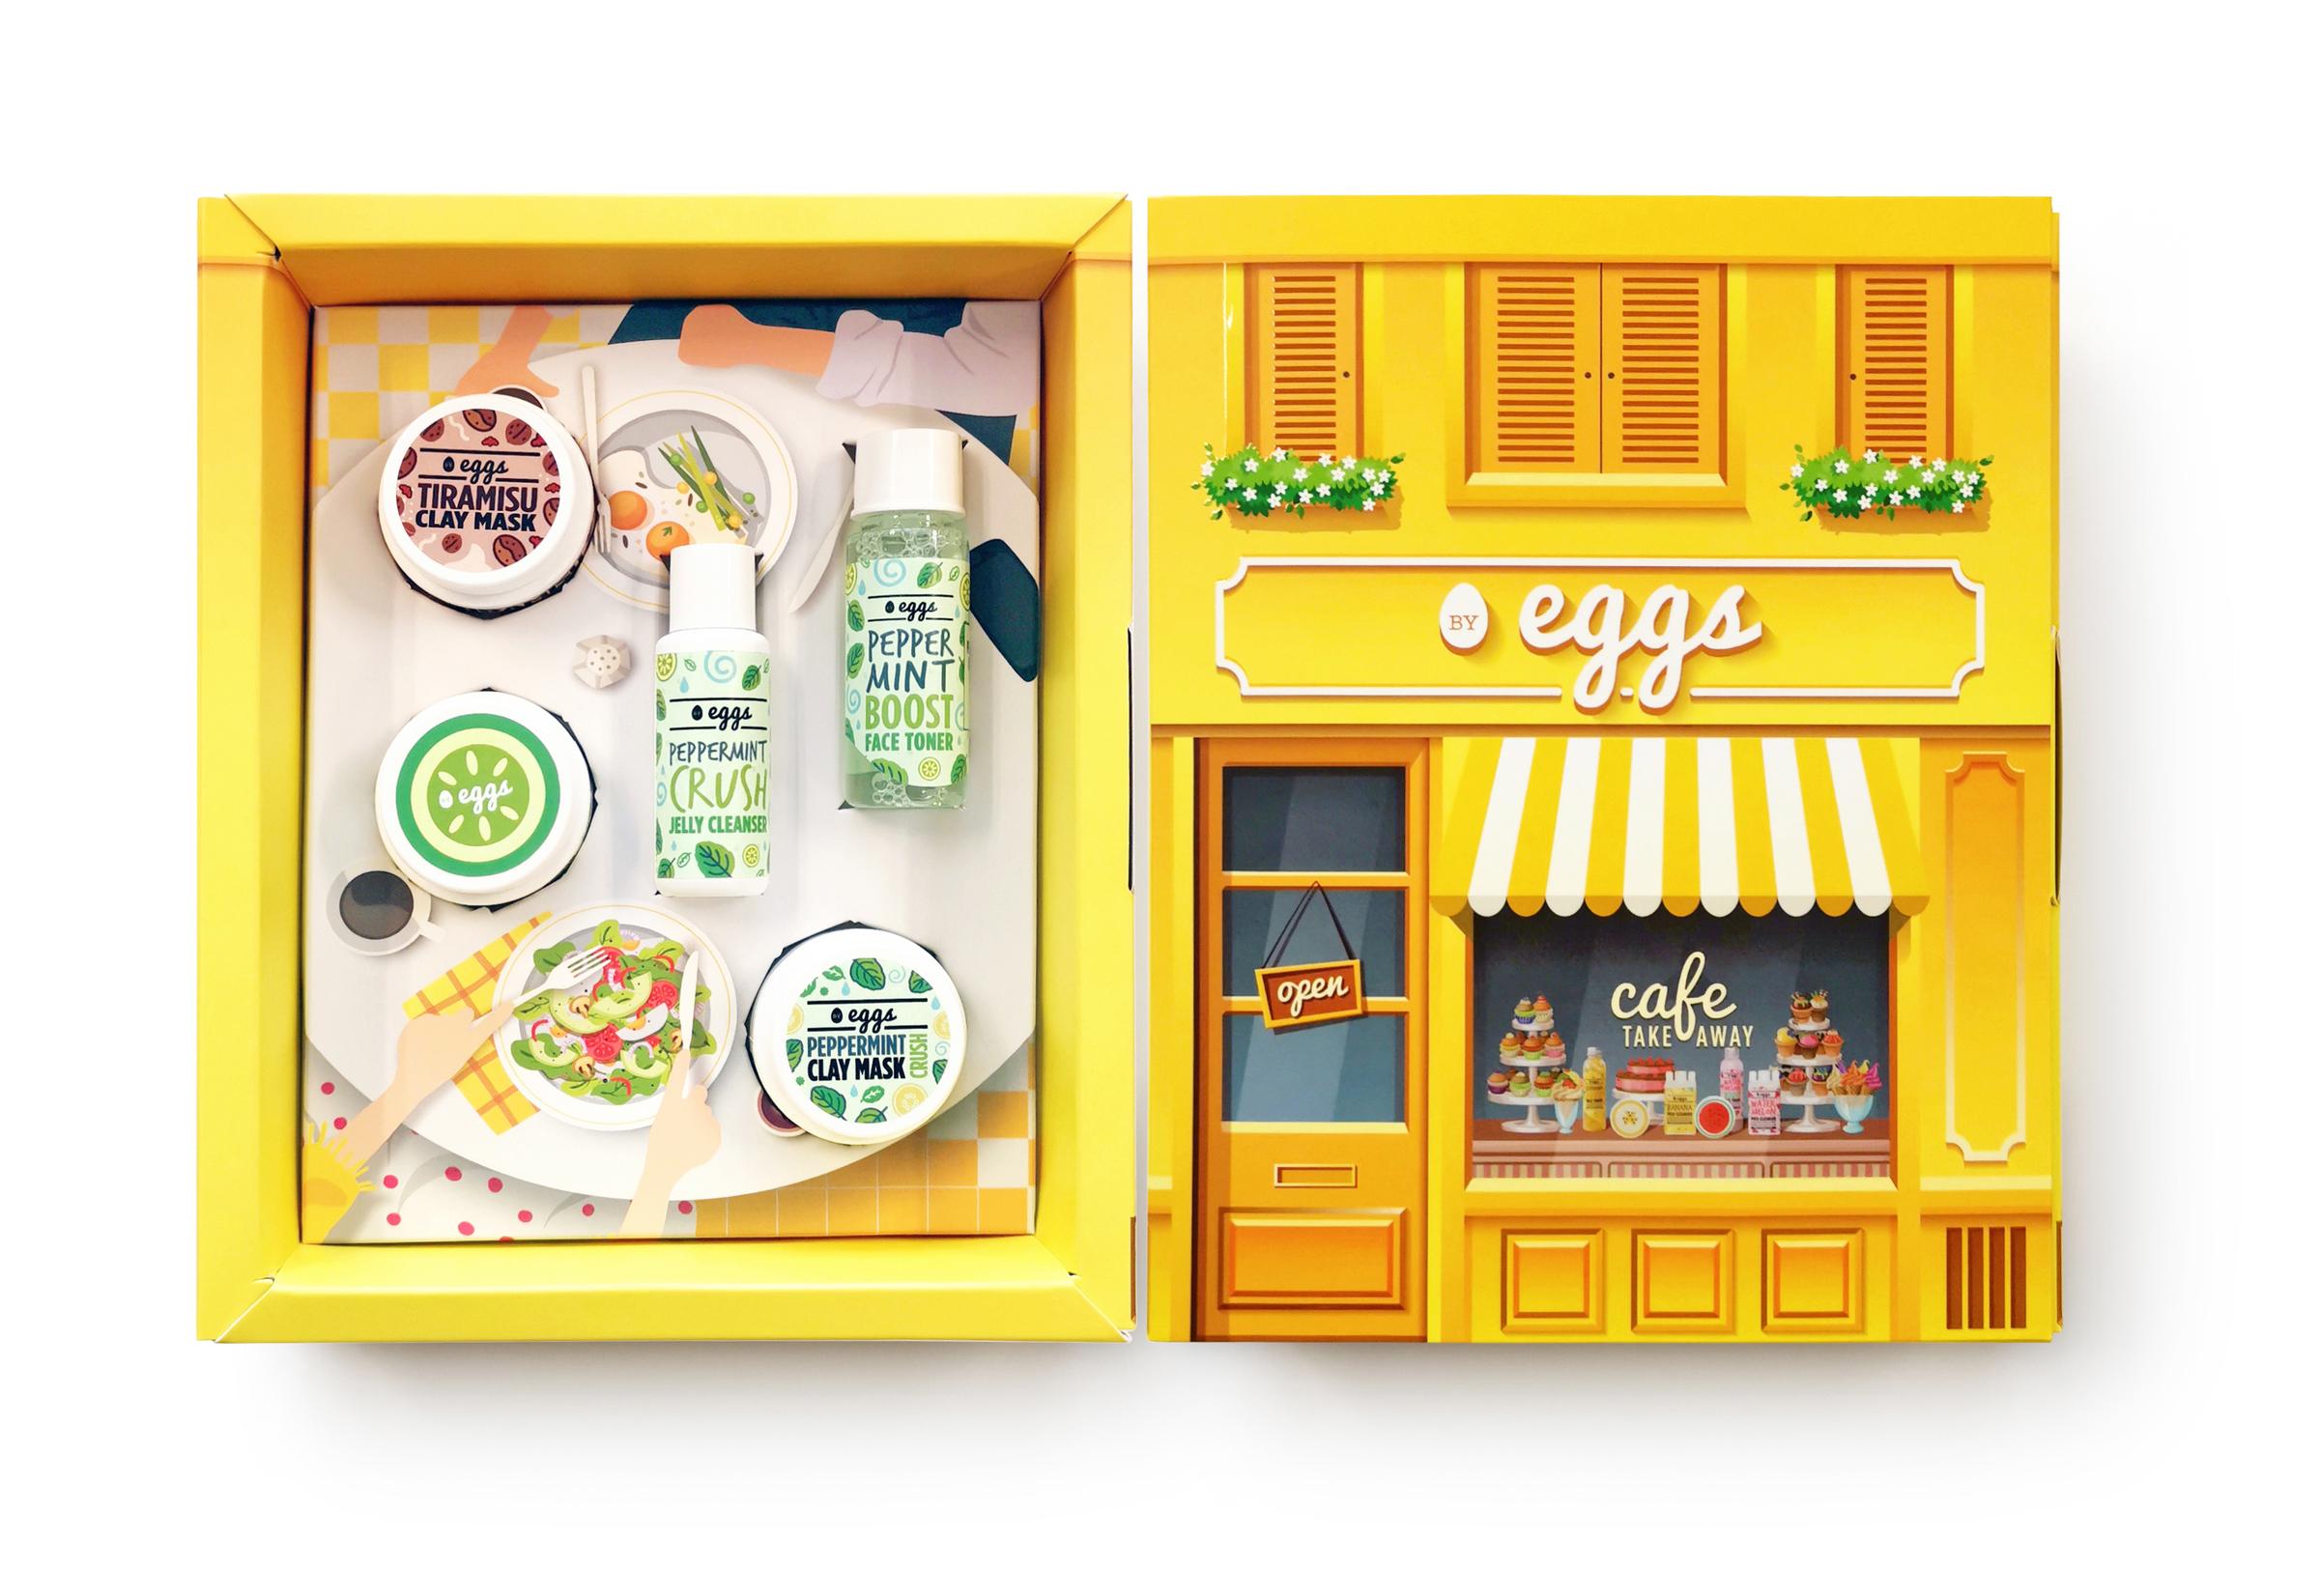 ByEggs-Cafe-Box-Peppermint Set-large.jpg